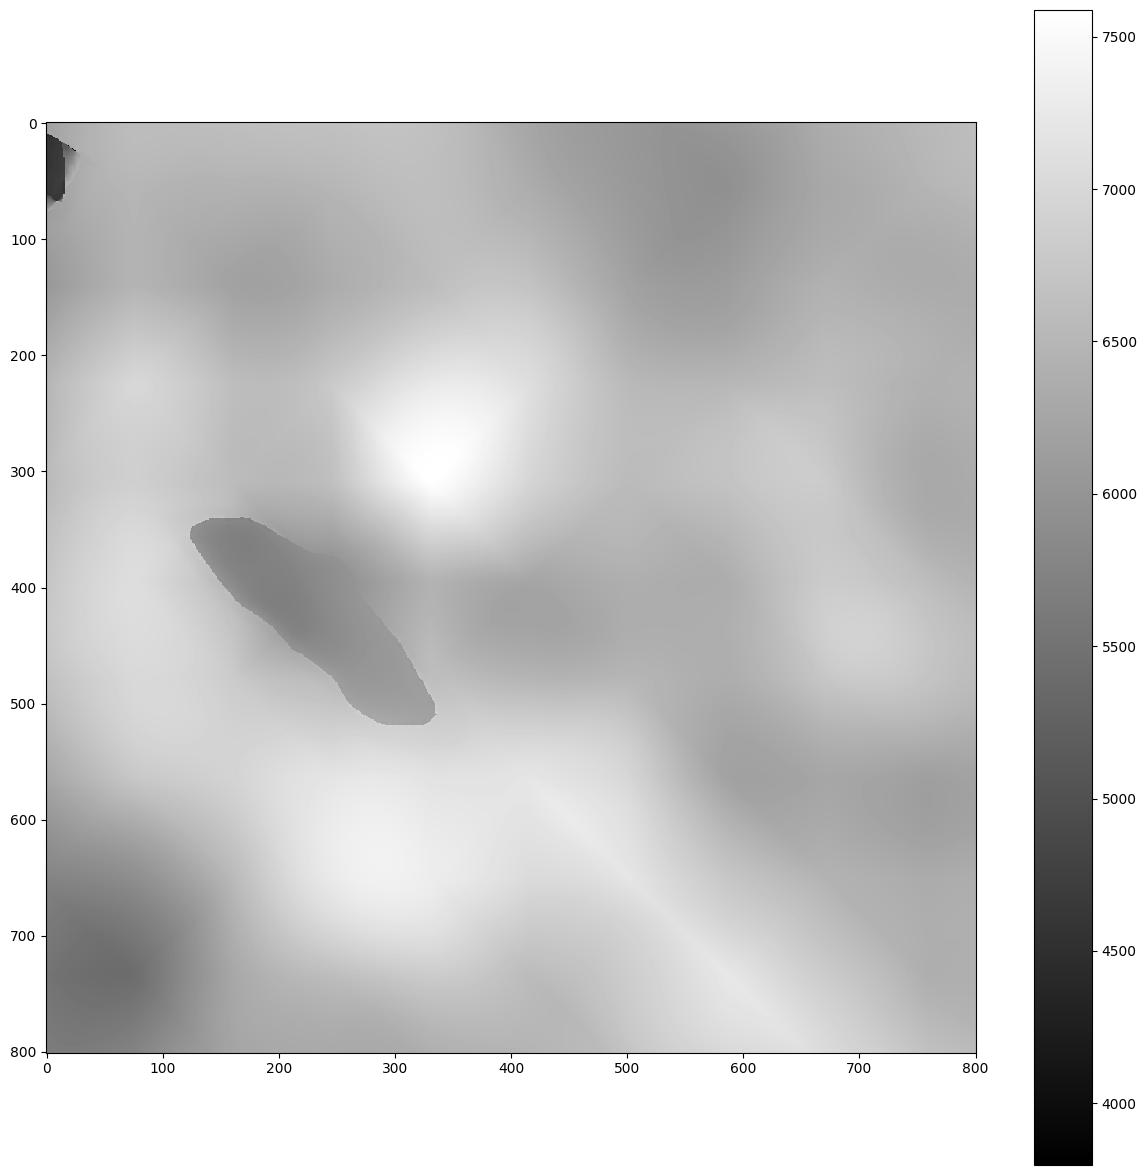 bench/seismic/wp/la_habra/meshes/velocity_model/plots/vp_7500.png